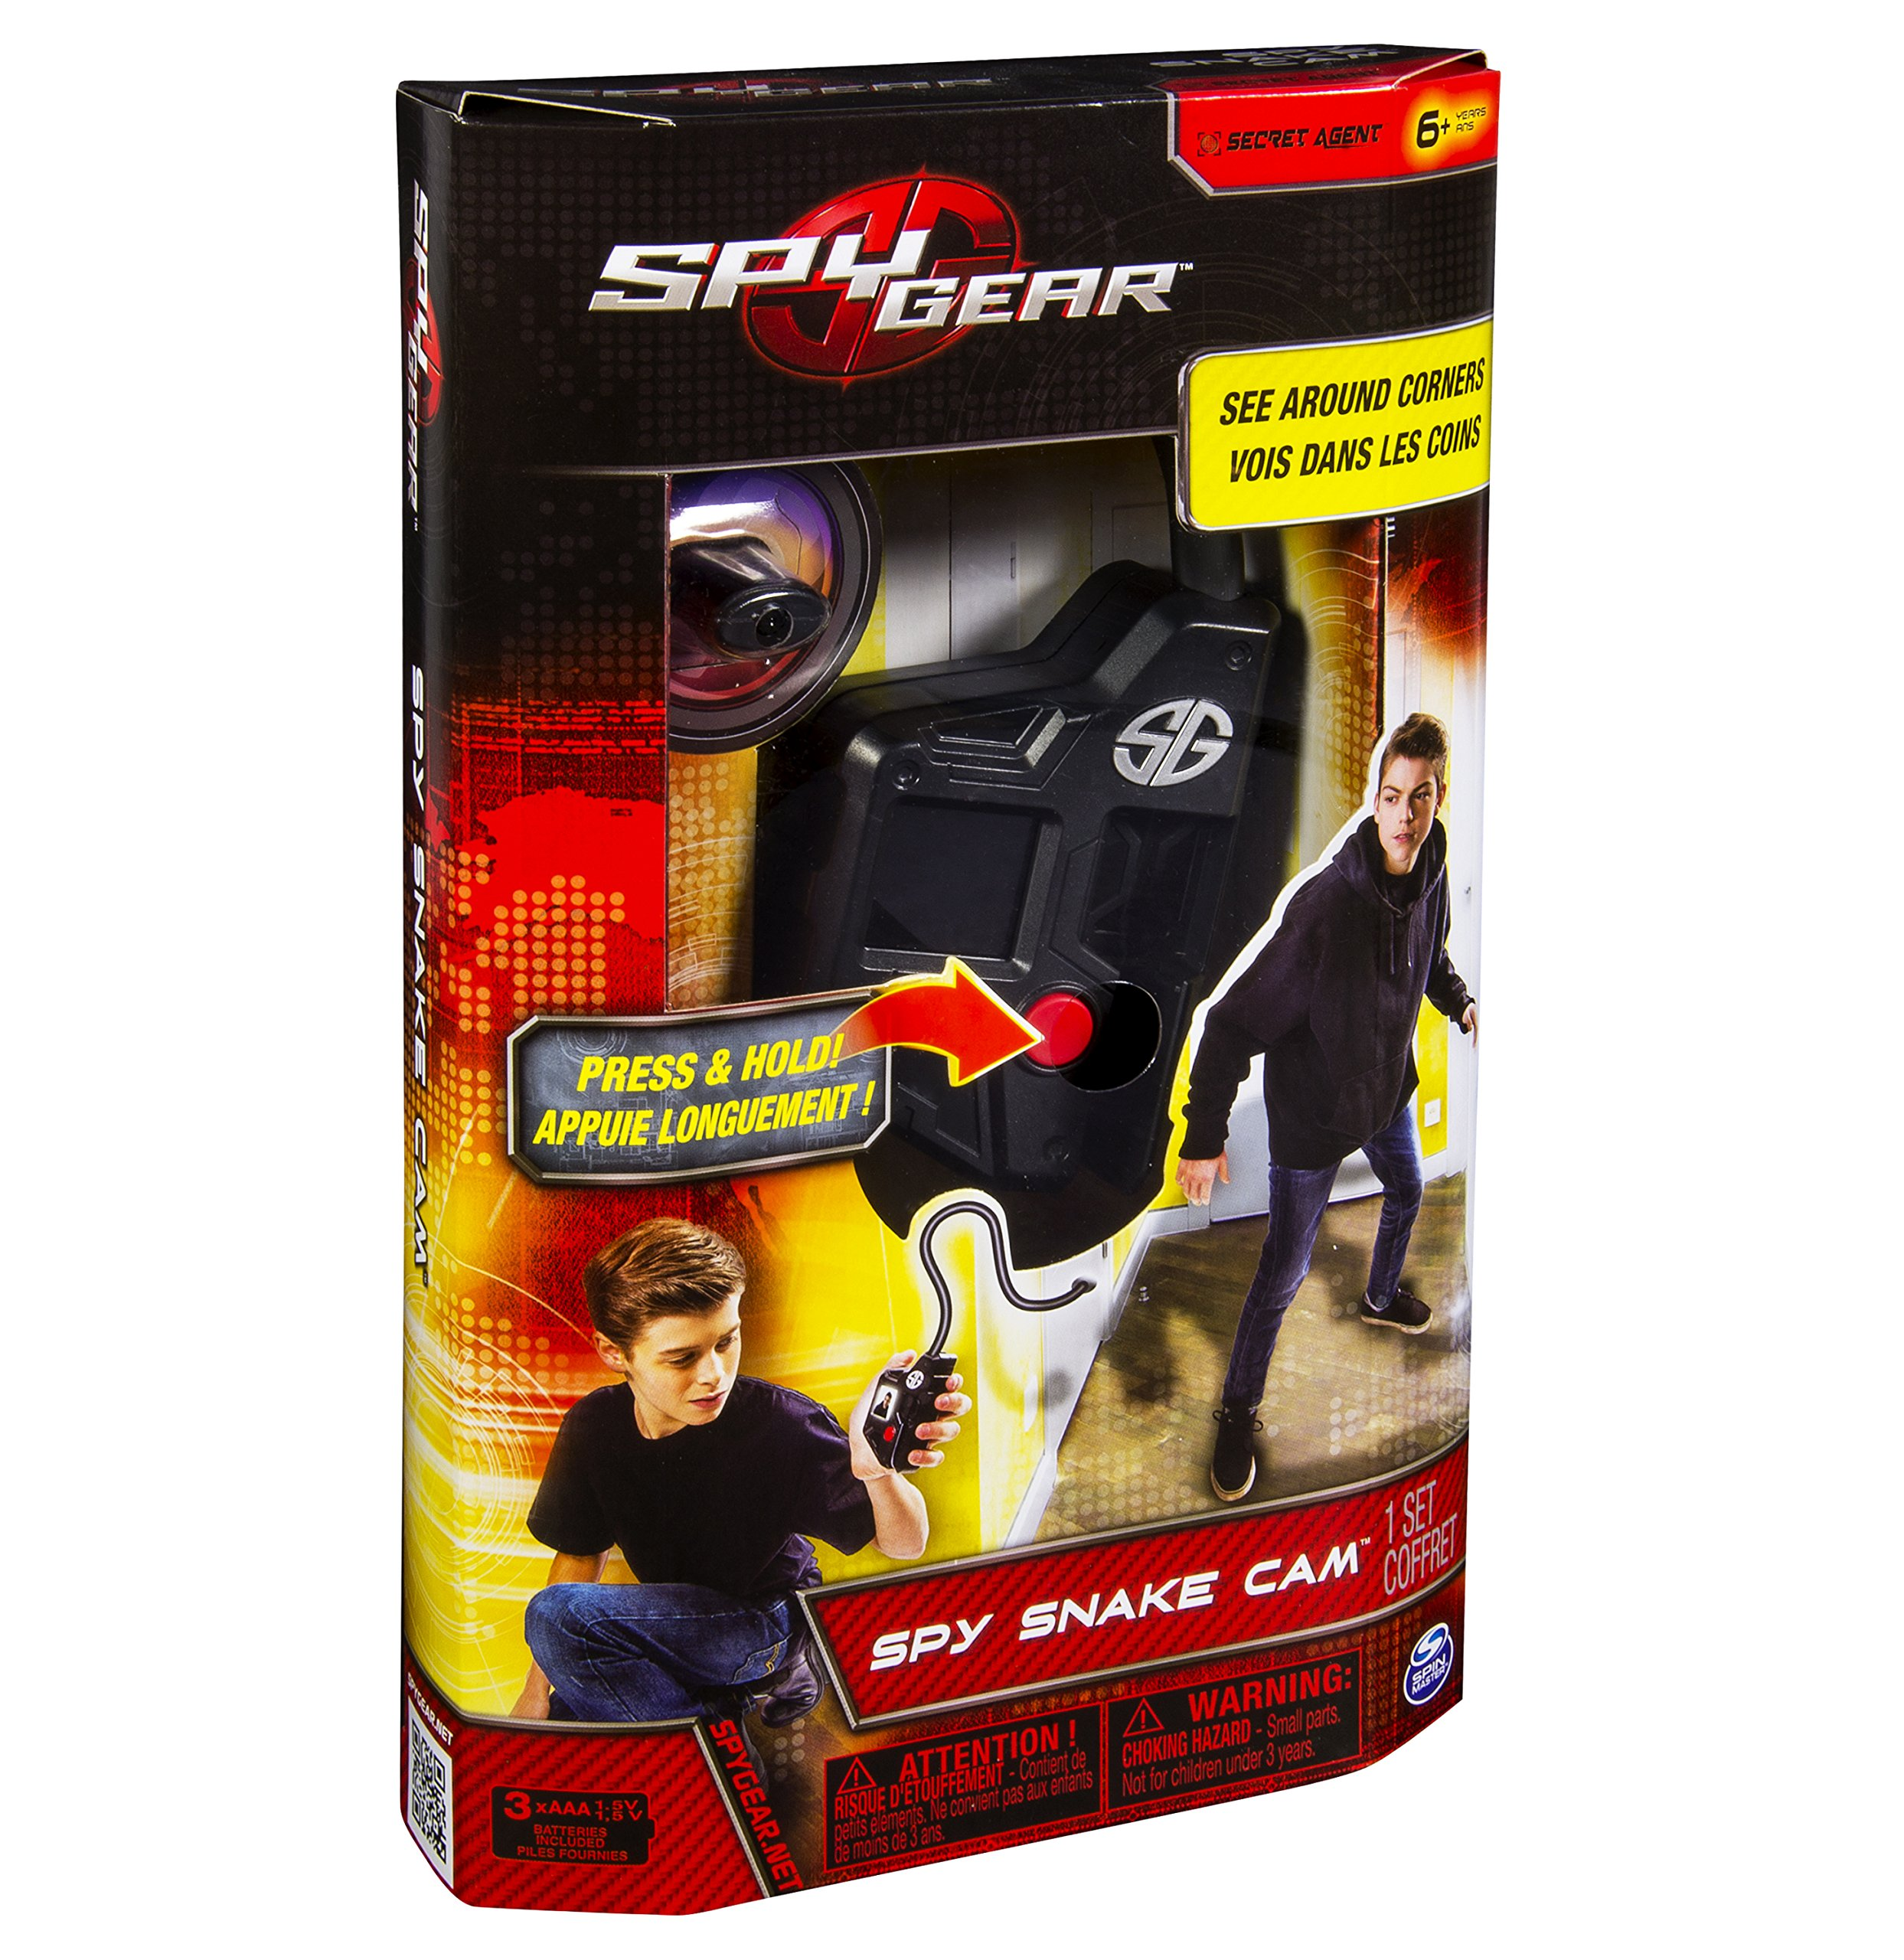 Spy Gear, Spy Snake Cam by Spy Gear (Image #6)